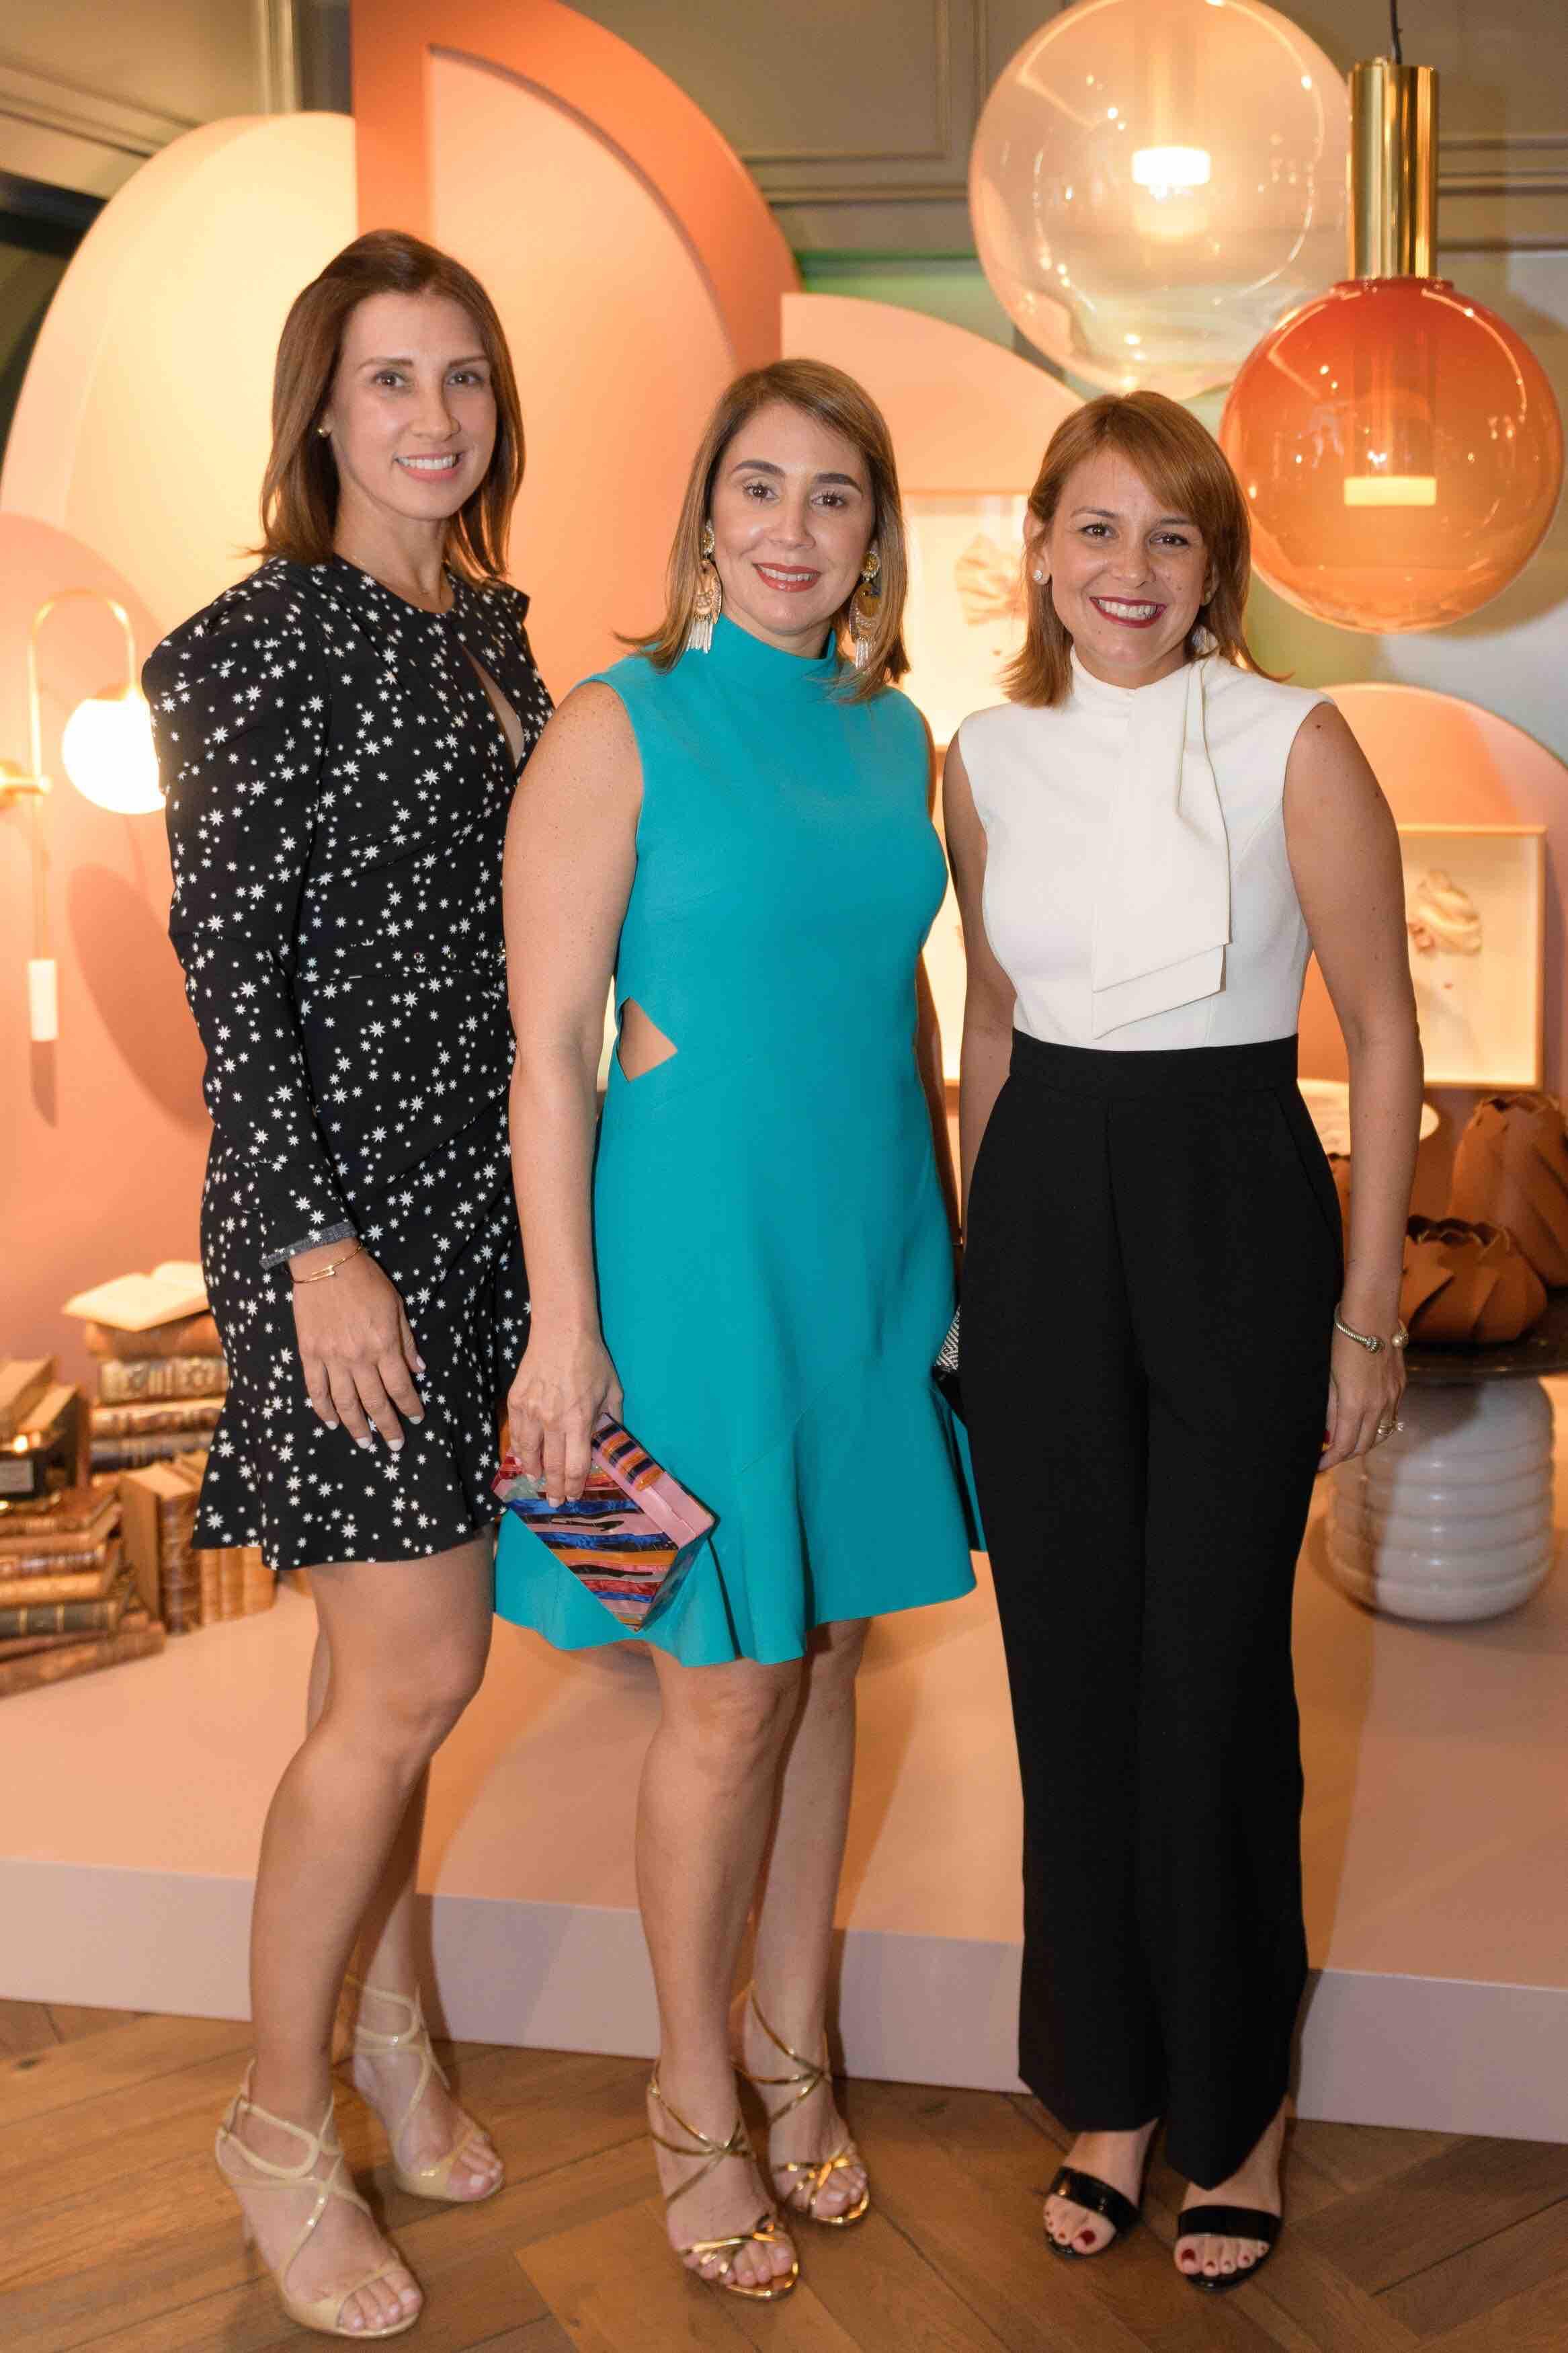 4.Laura Betances, Elizabet hBarceló De Bogaert & Maite Abreu DeMar